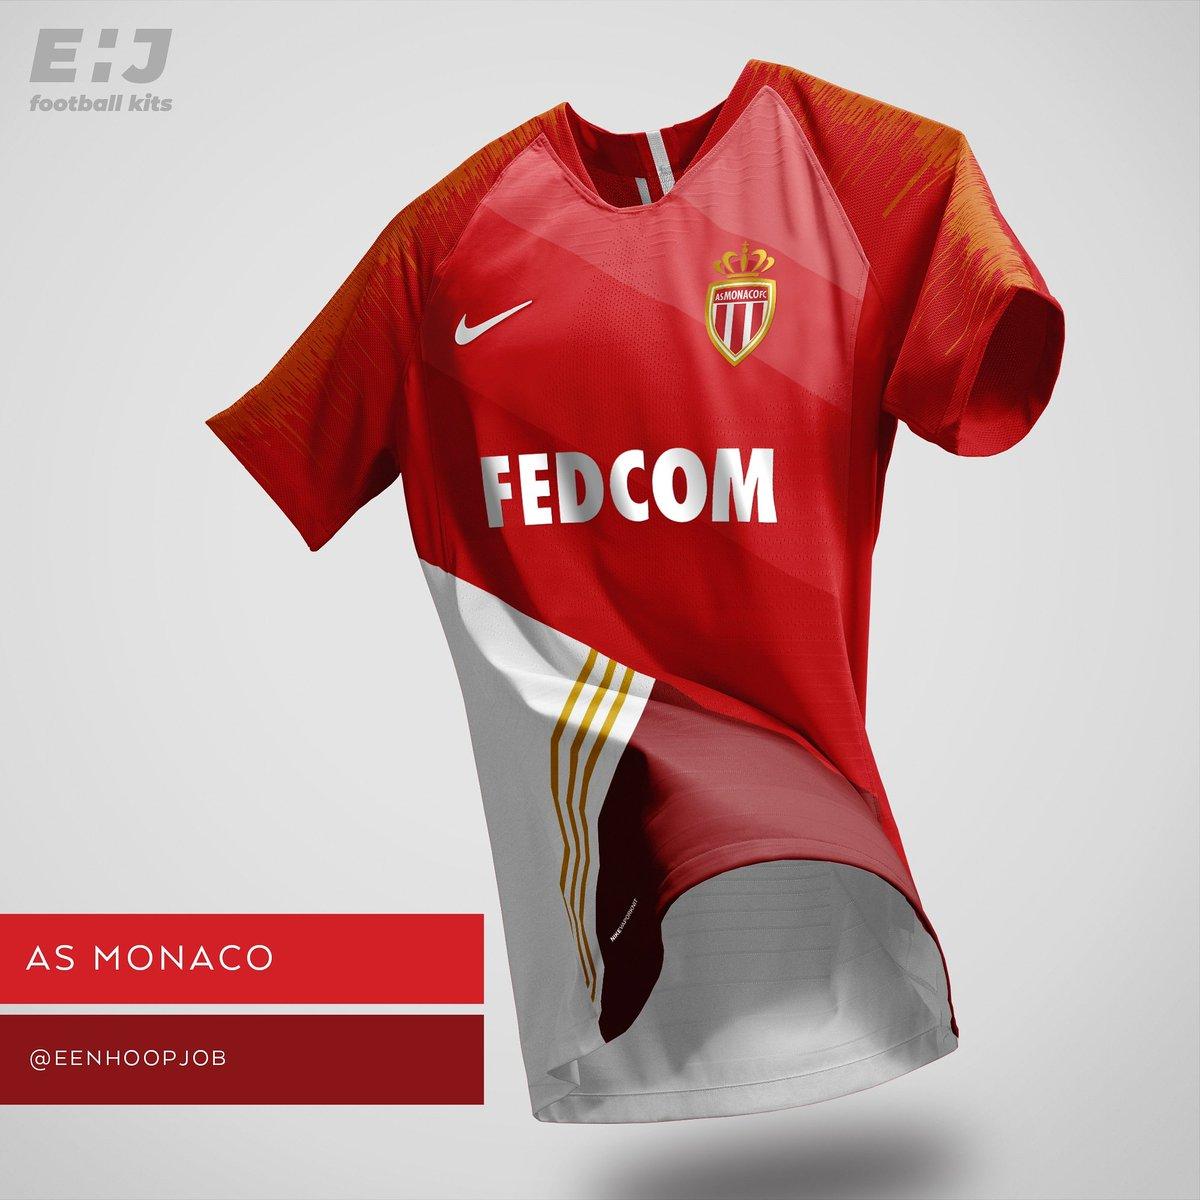 Job Eenhoopjob Football Kit Designs On Twitter As Monaco Home